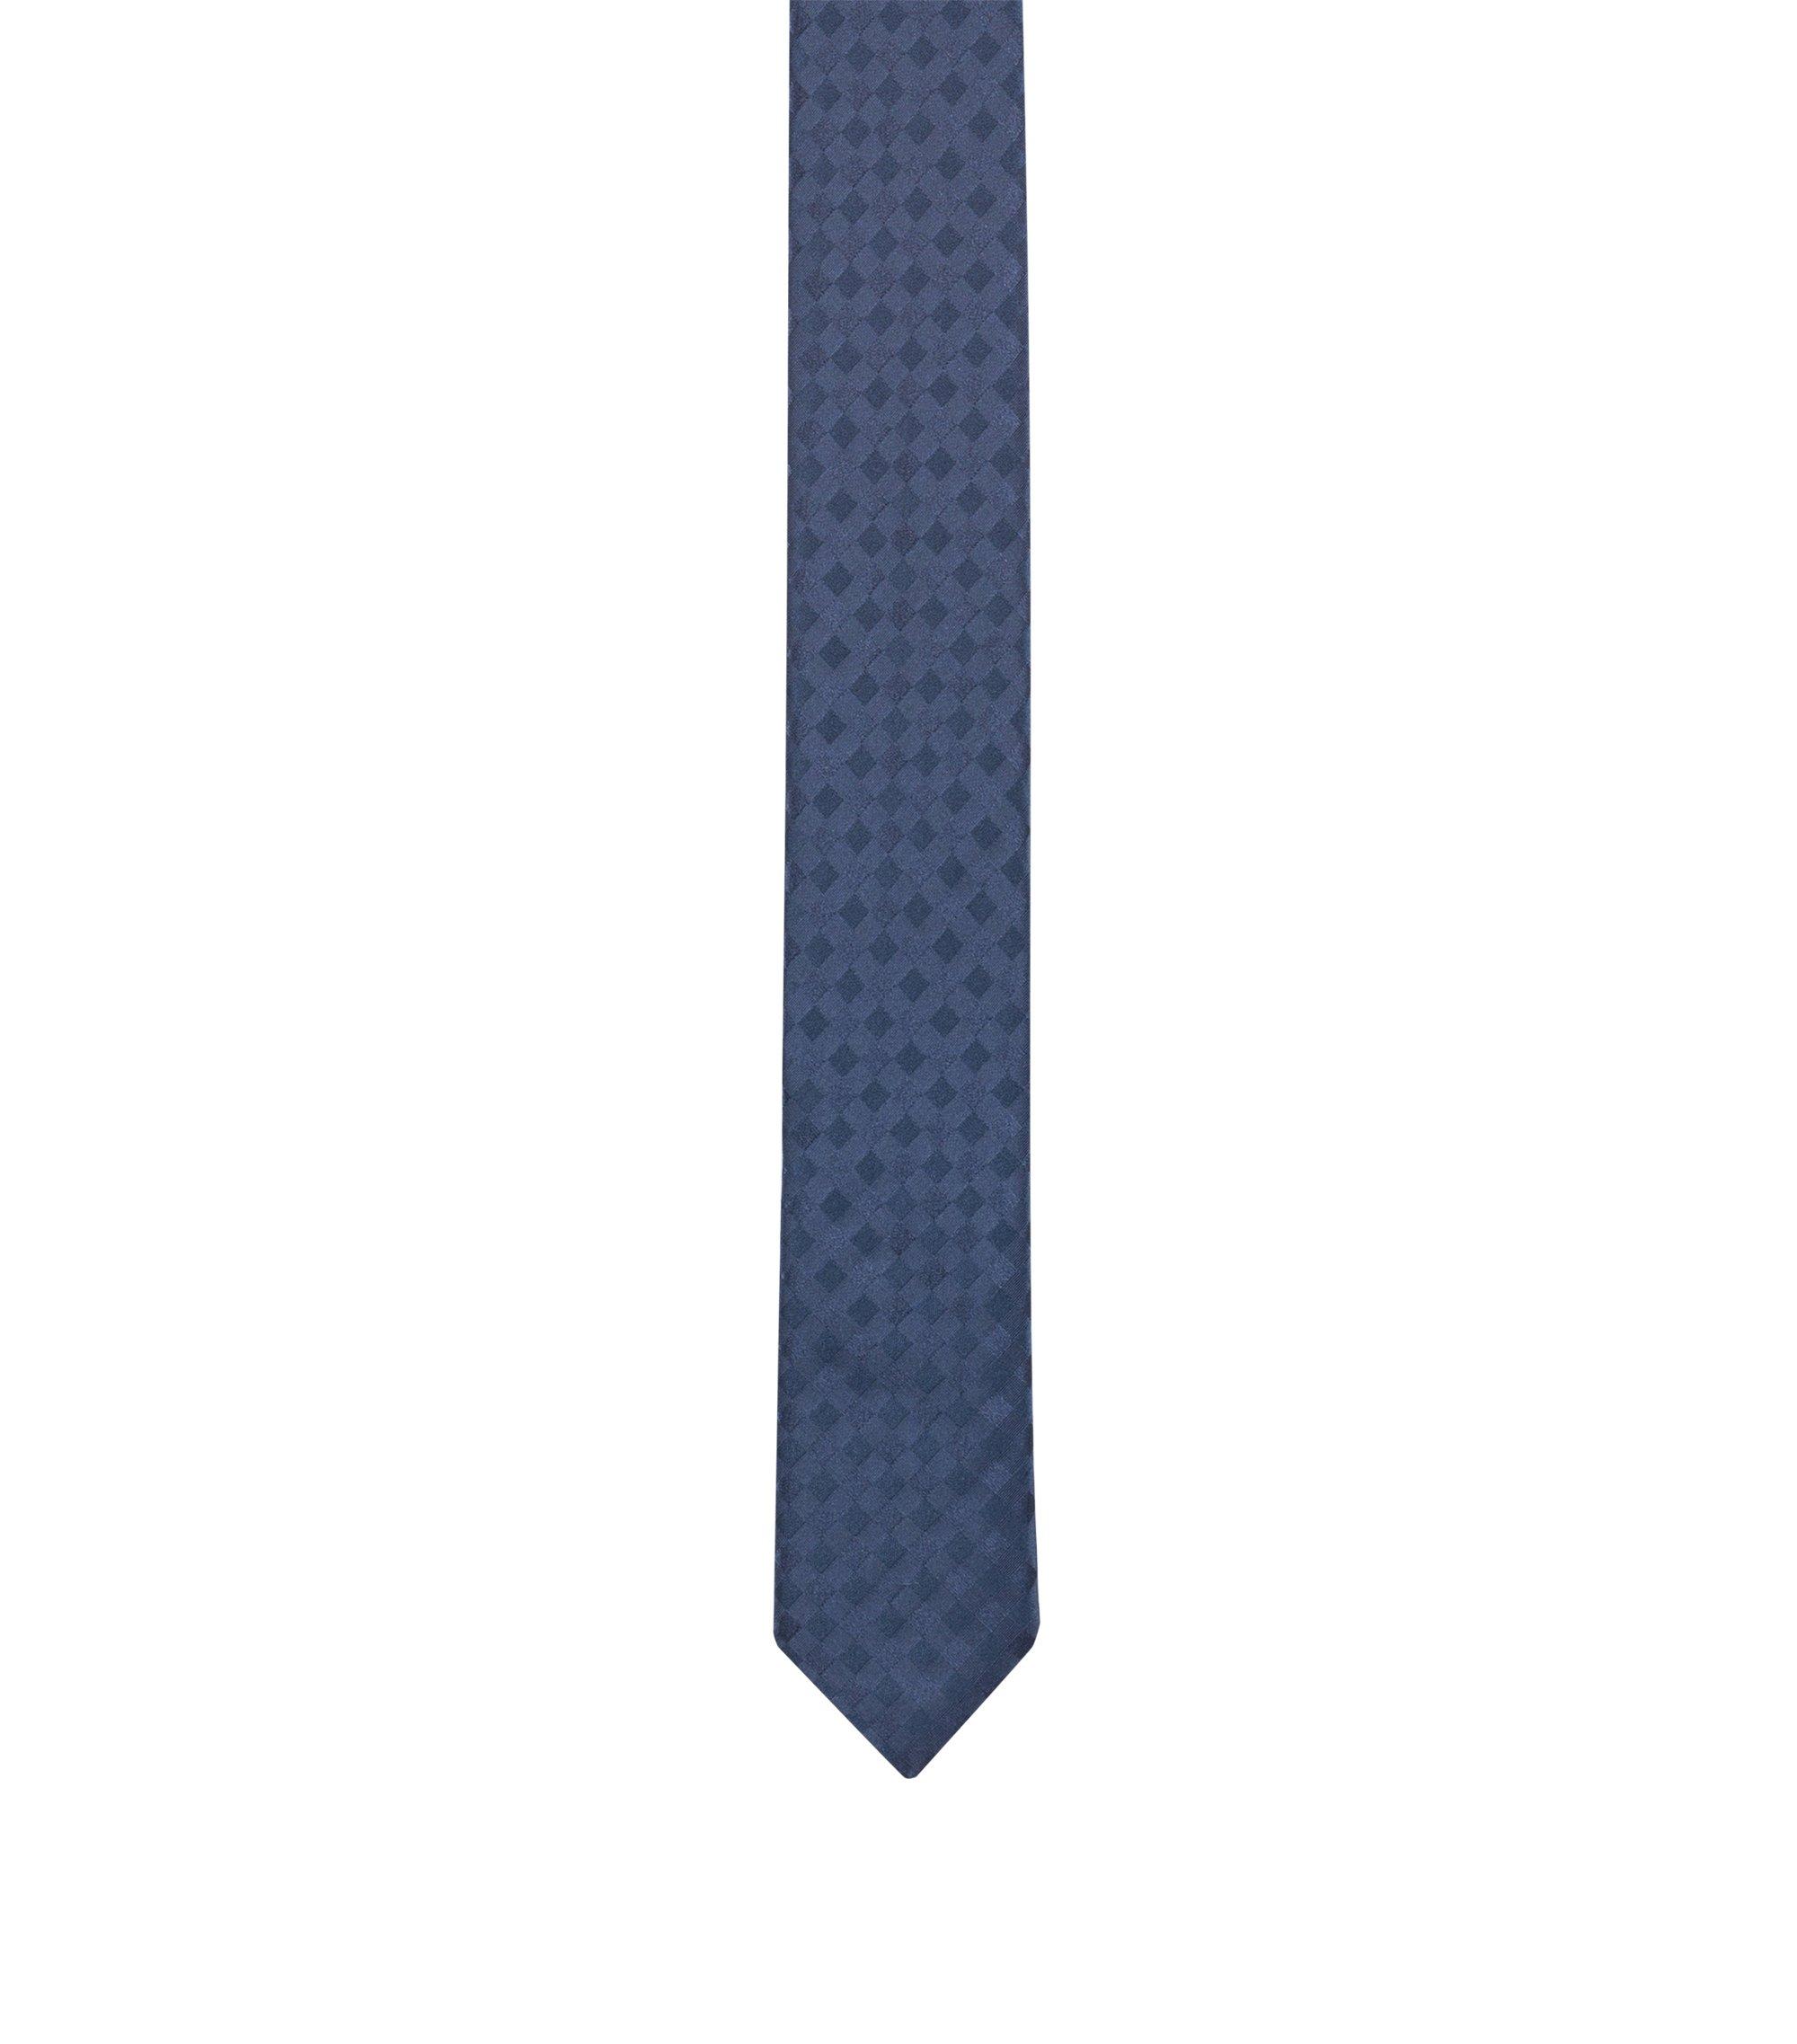 Krawatte aus Seiden-Jacquard mit tonalem Karo, Dunkelblau